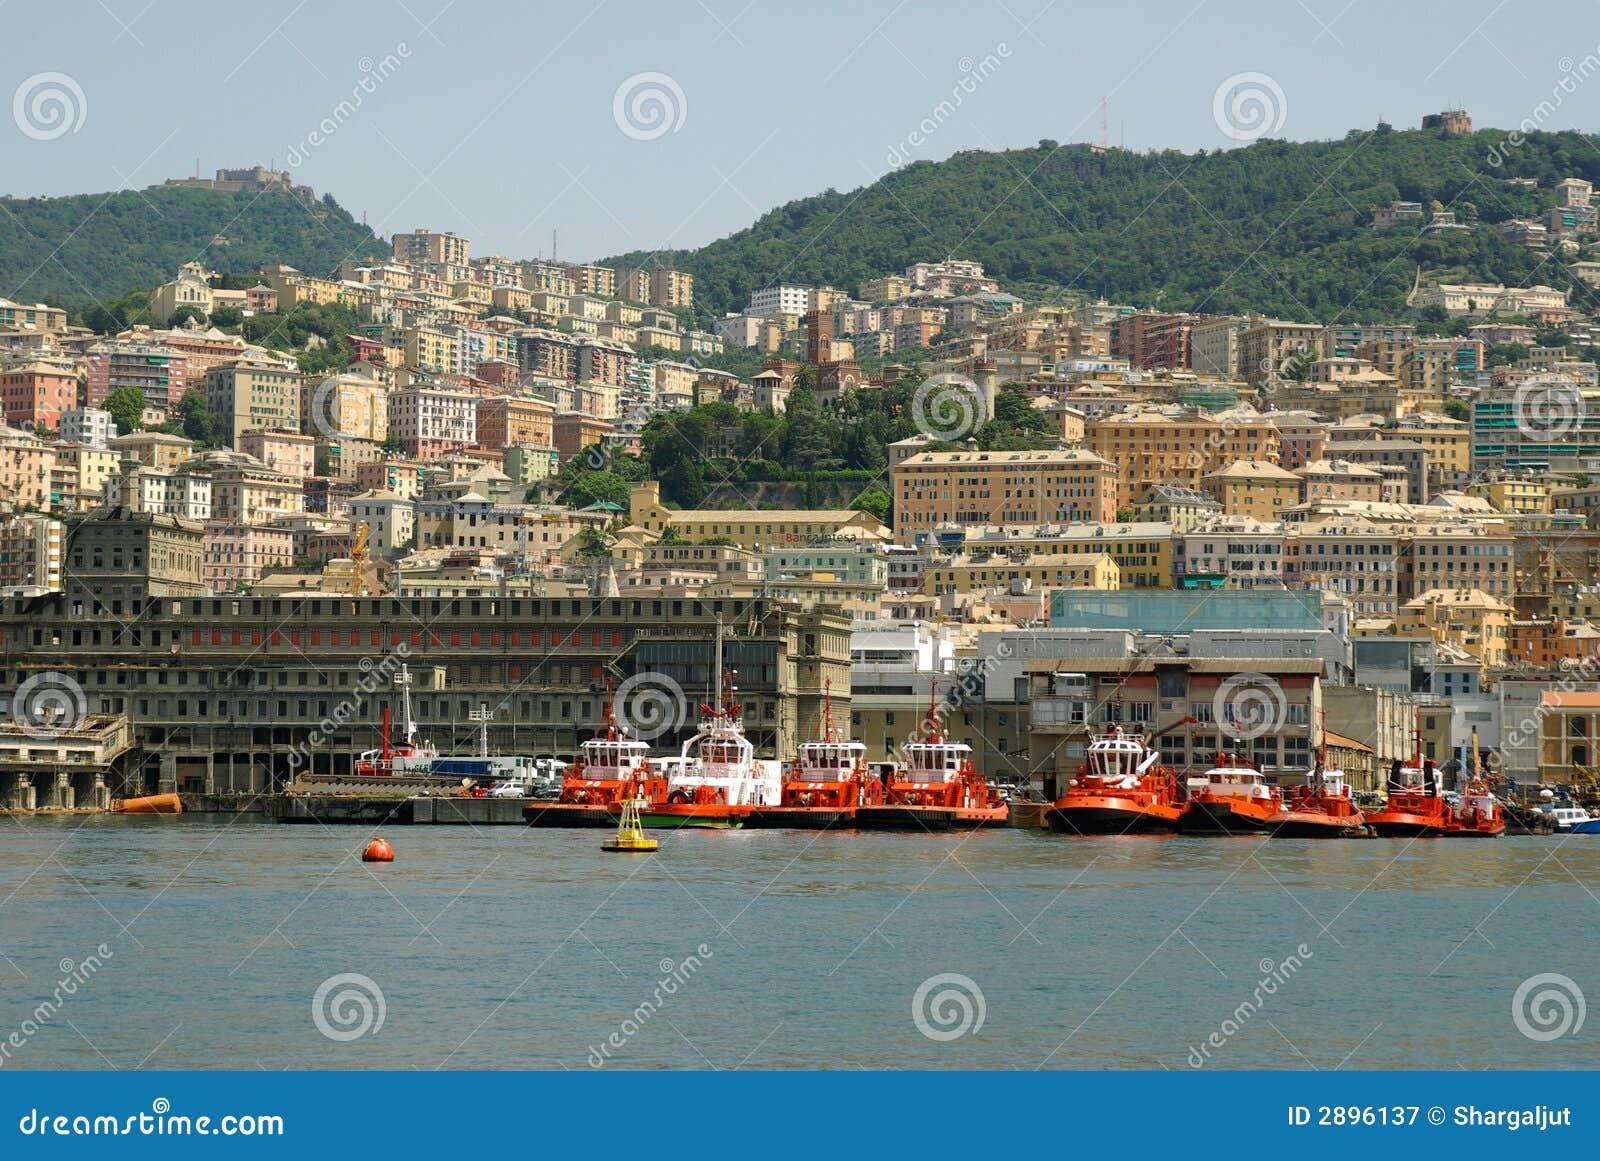 View Of Genoa City Italy Royalty Free Stock Photography Image 2896137